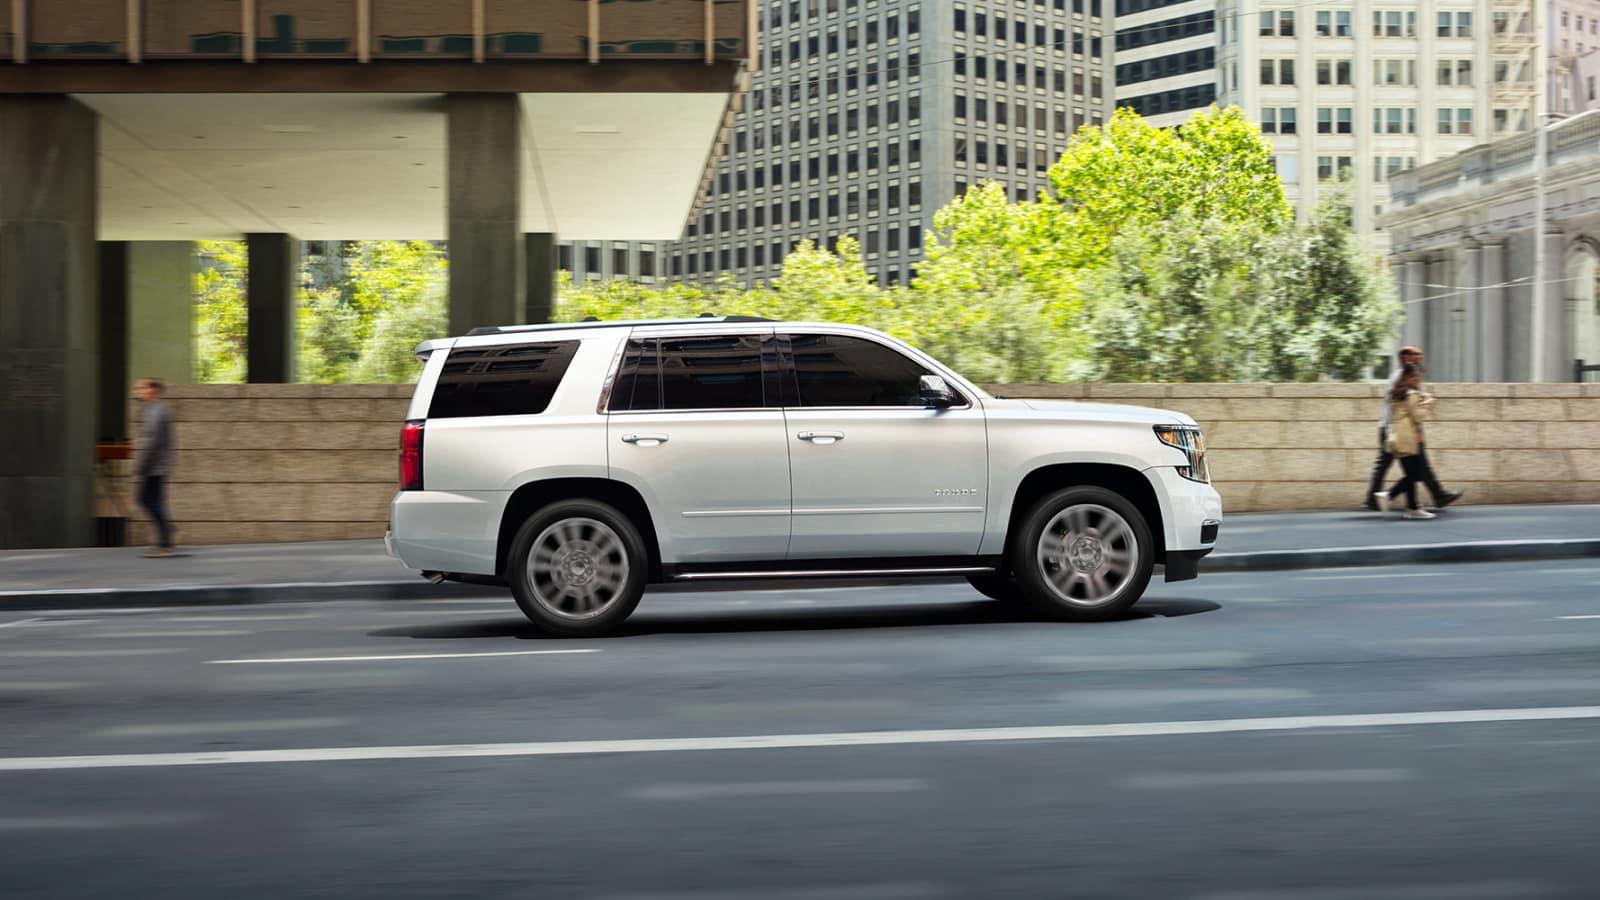 2020 Chevrolet Tahoe For Sale In Pensacola, FL